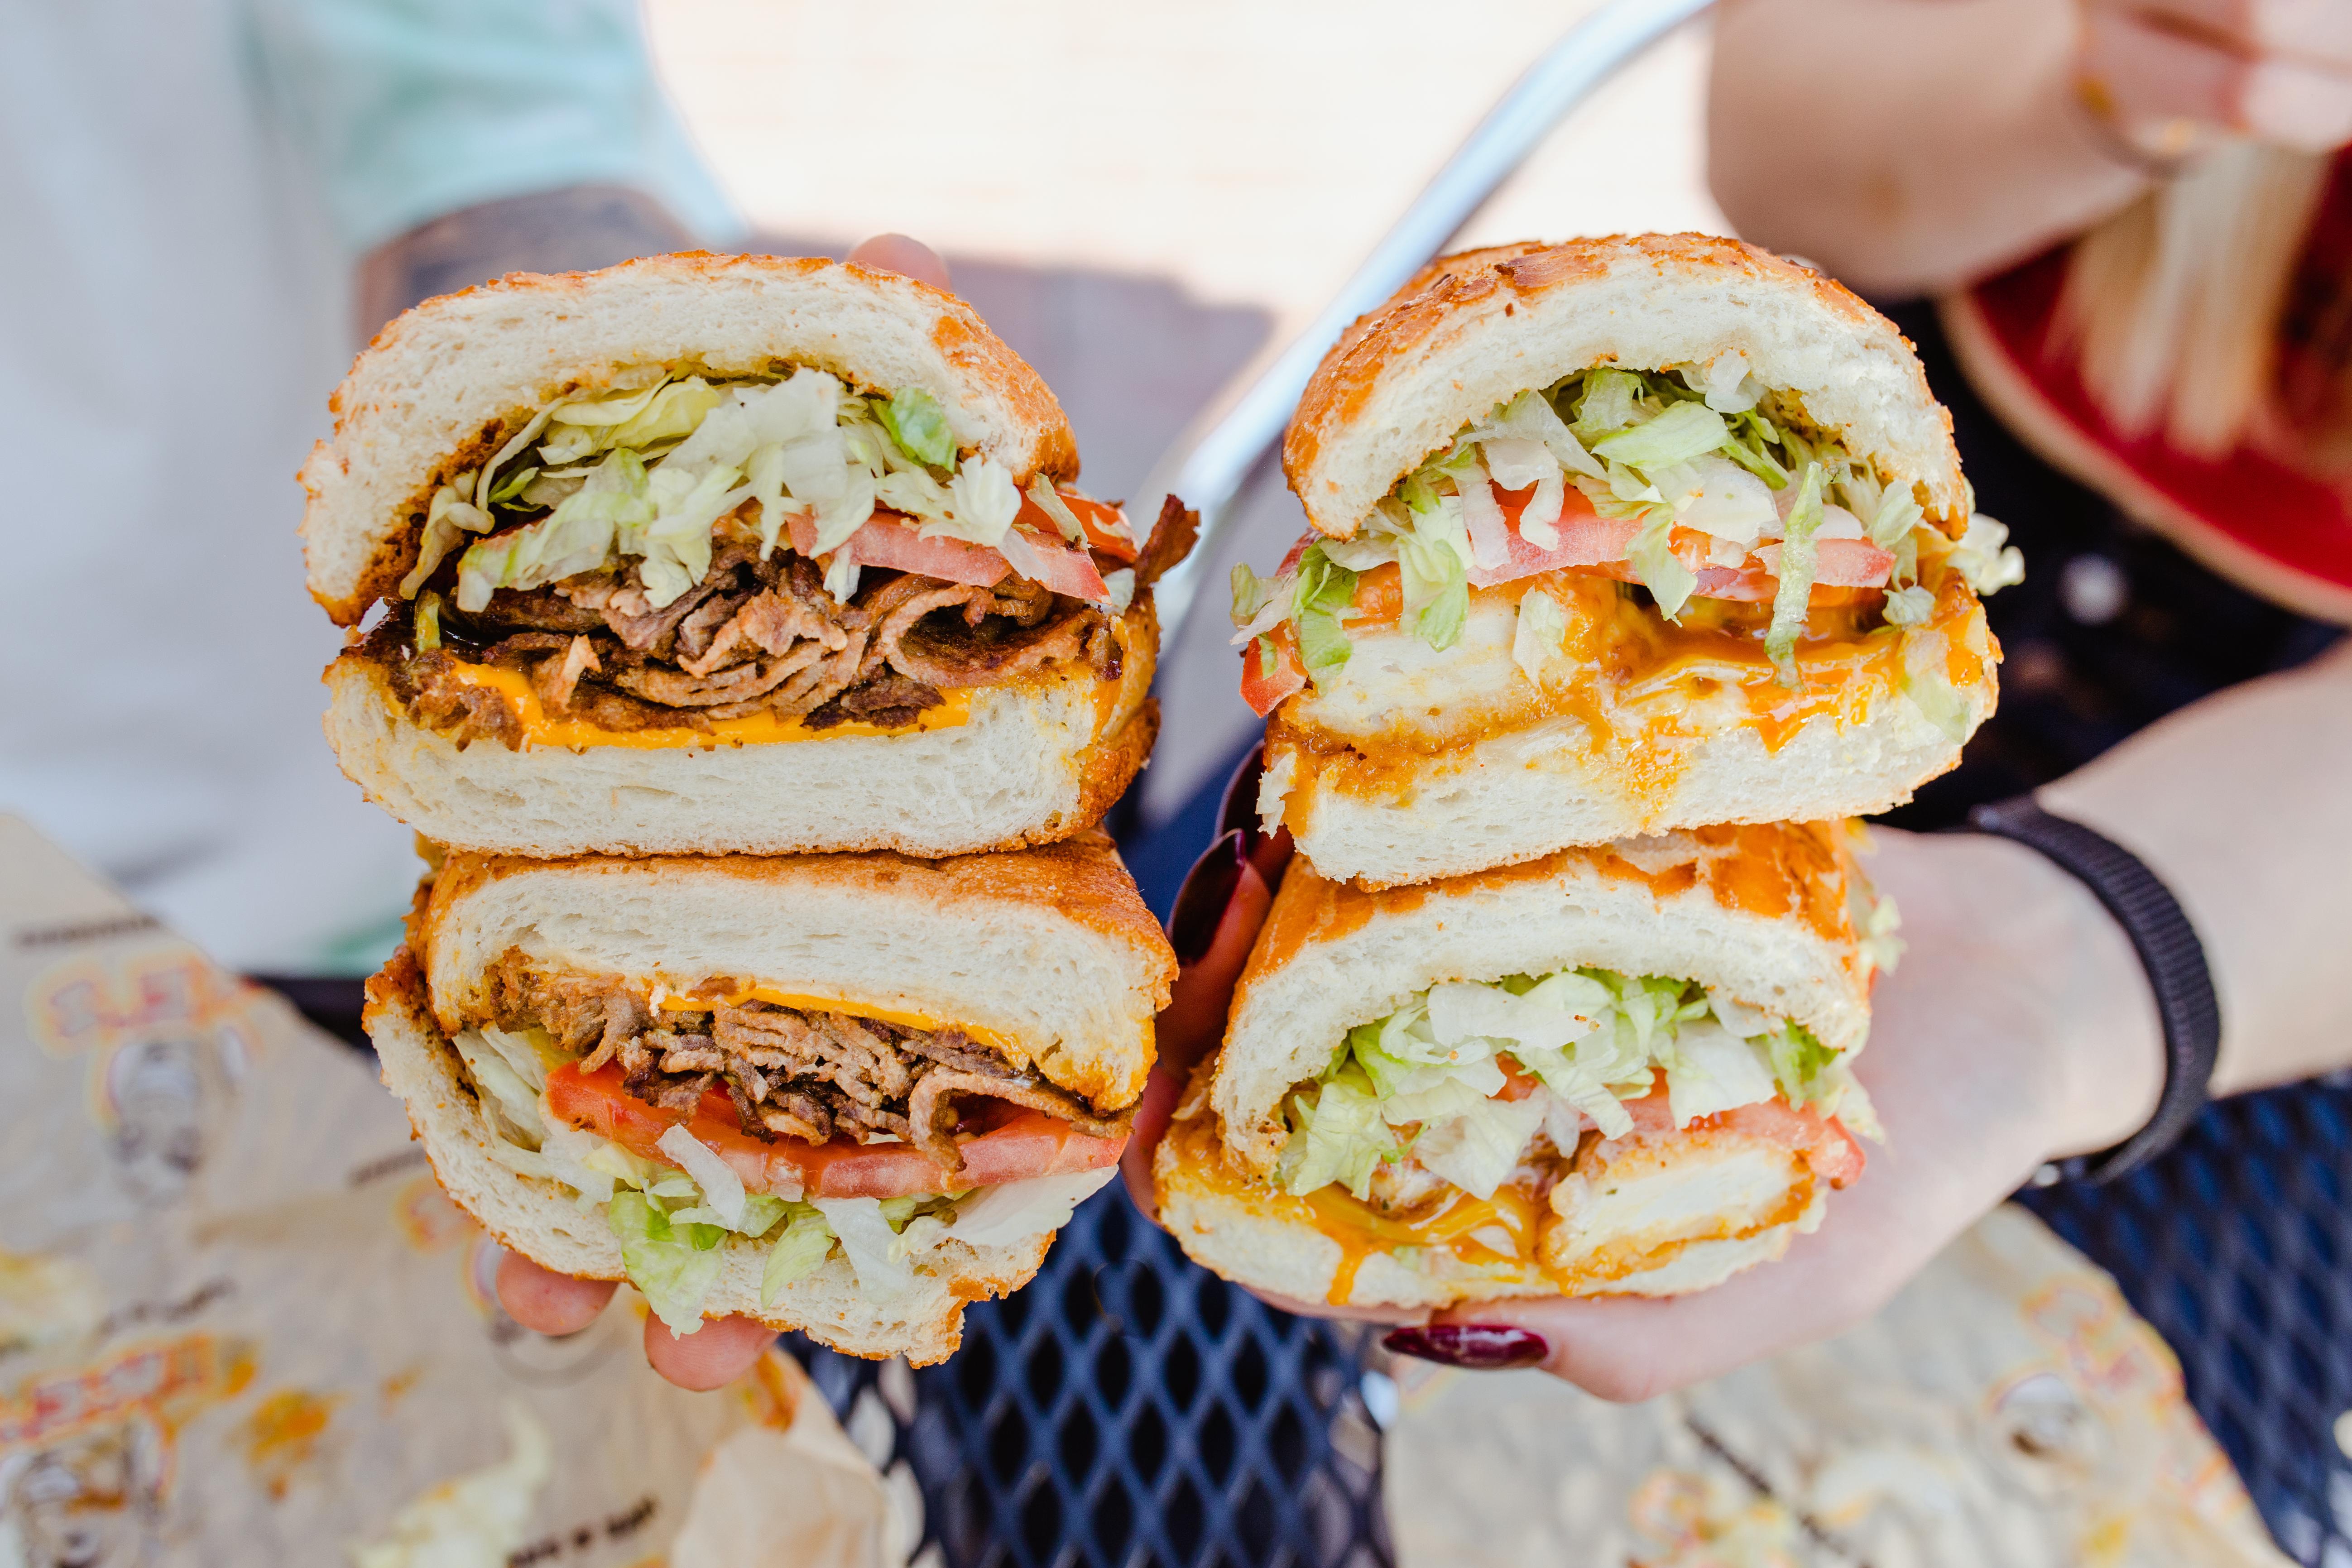 San Francisco Sandwich Chain Quickly Opens Second Austin Location